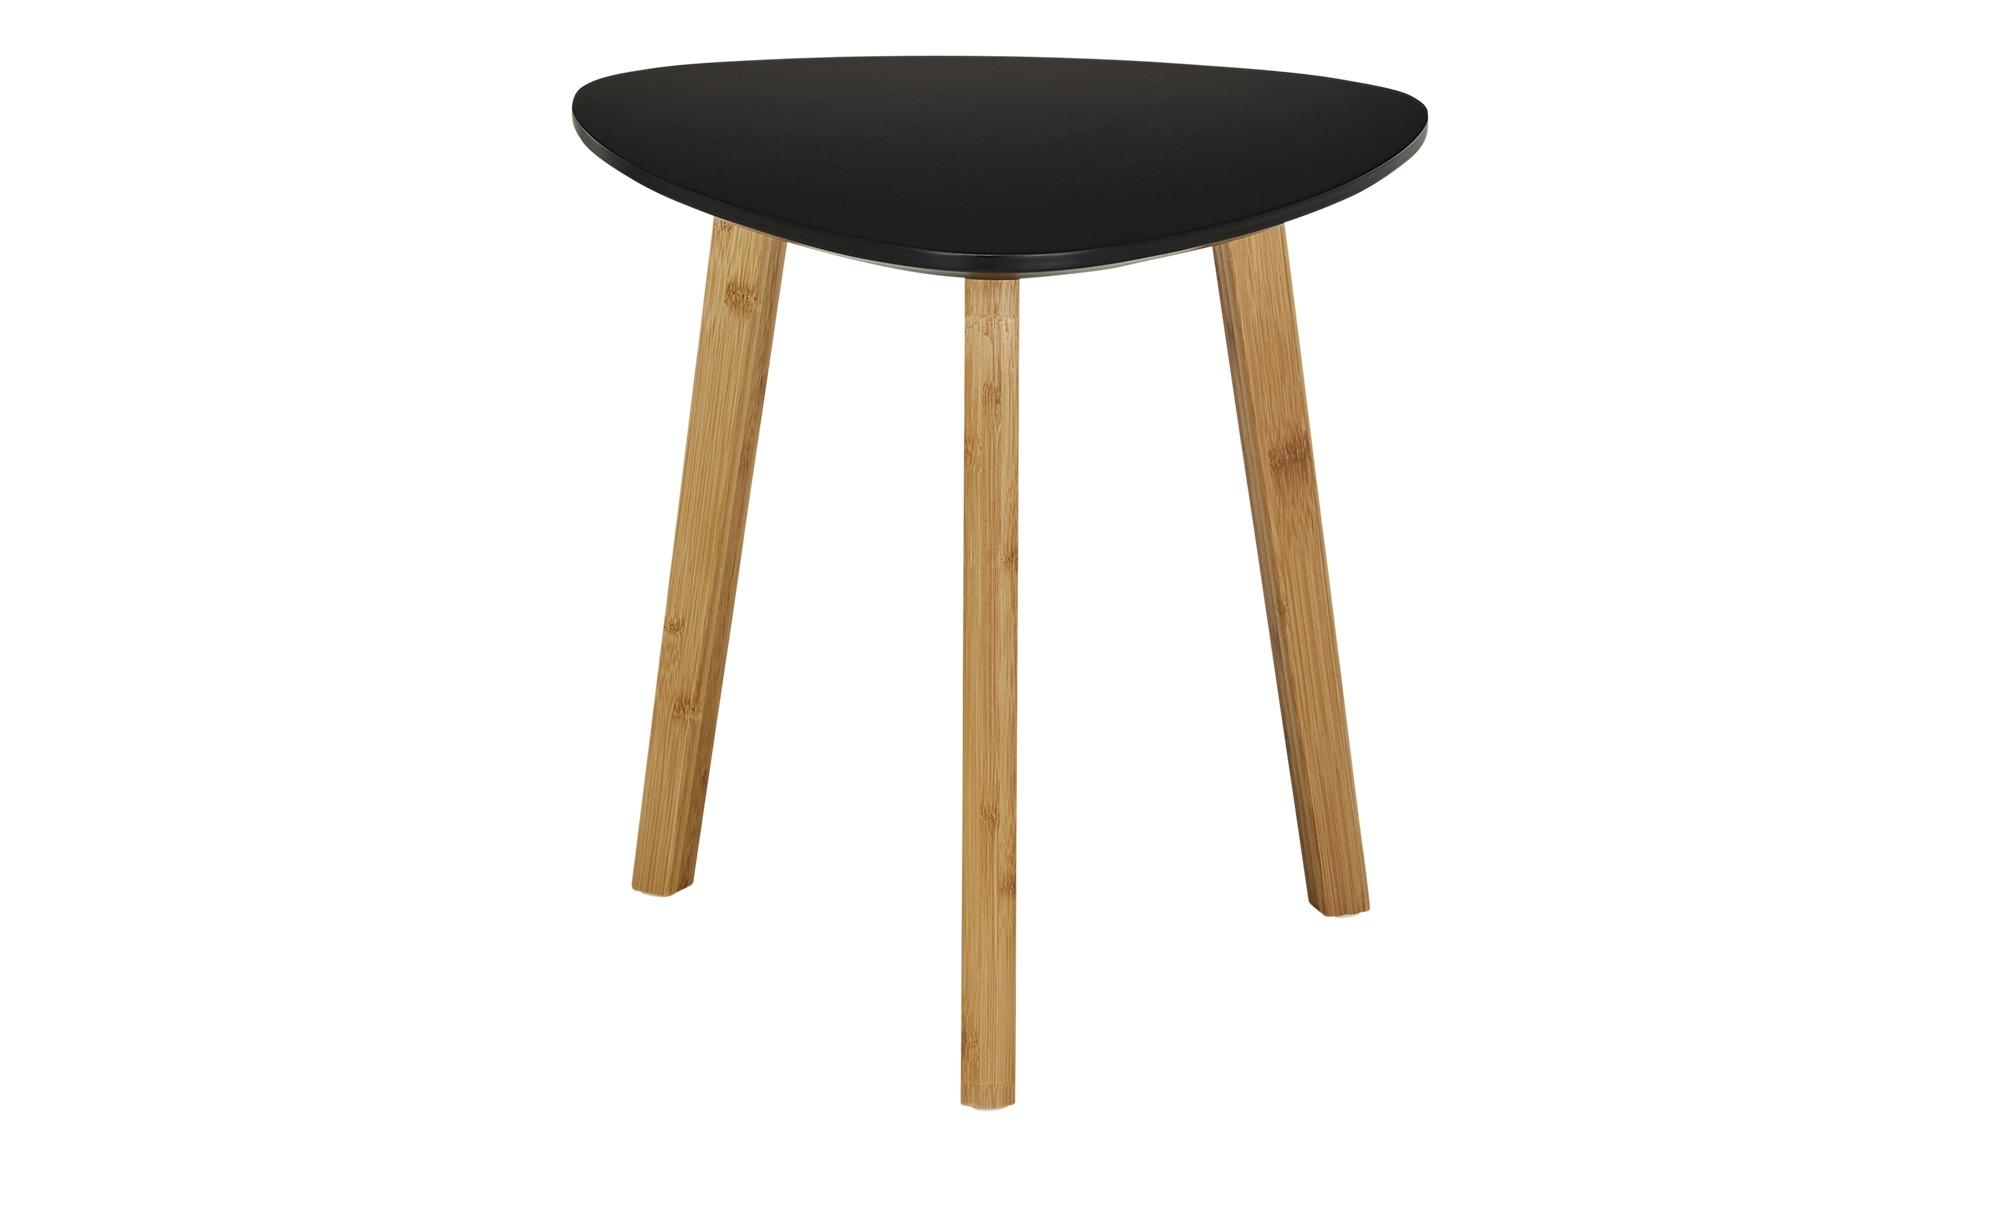 Beistelltisch  Bamboo ¦ schwarz ¦ Maße (cm): B: 40 H: 40 Tische > Beistelltische > Beistelltische ohne Rollen - Höffner